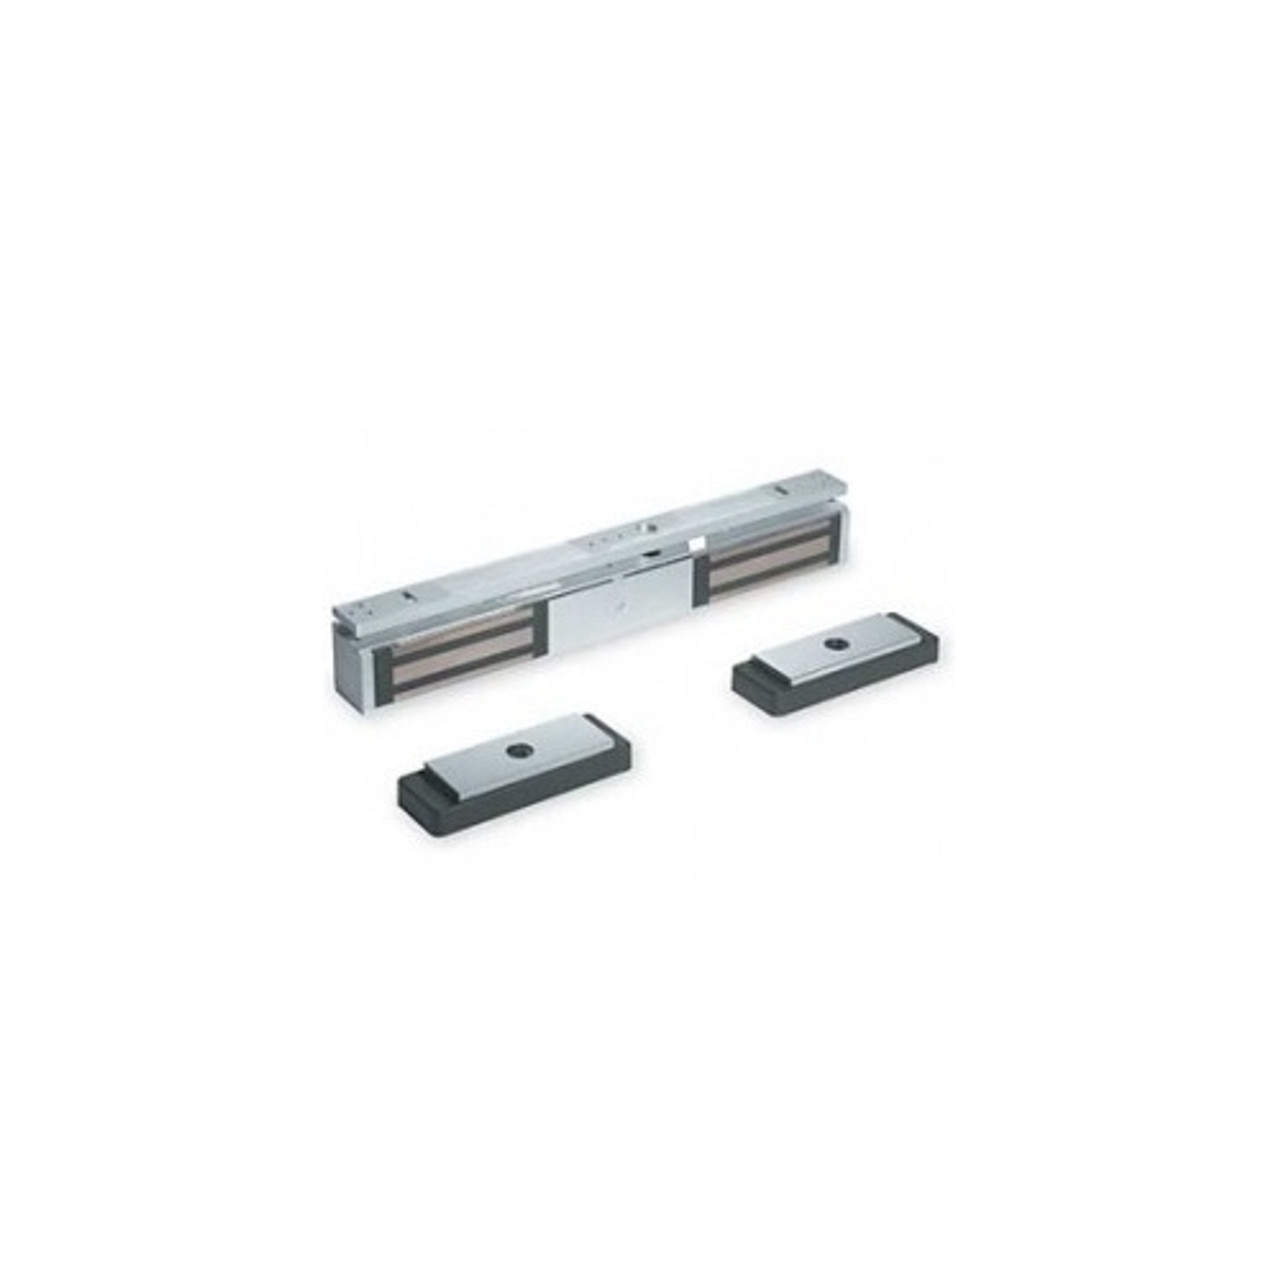 locknetics by schlage m422 series double electromagnetic lock [ 1280 x 1280 Pixel ]